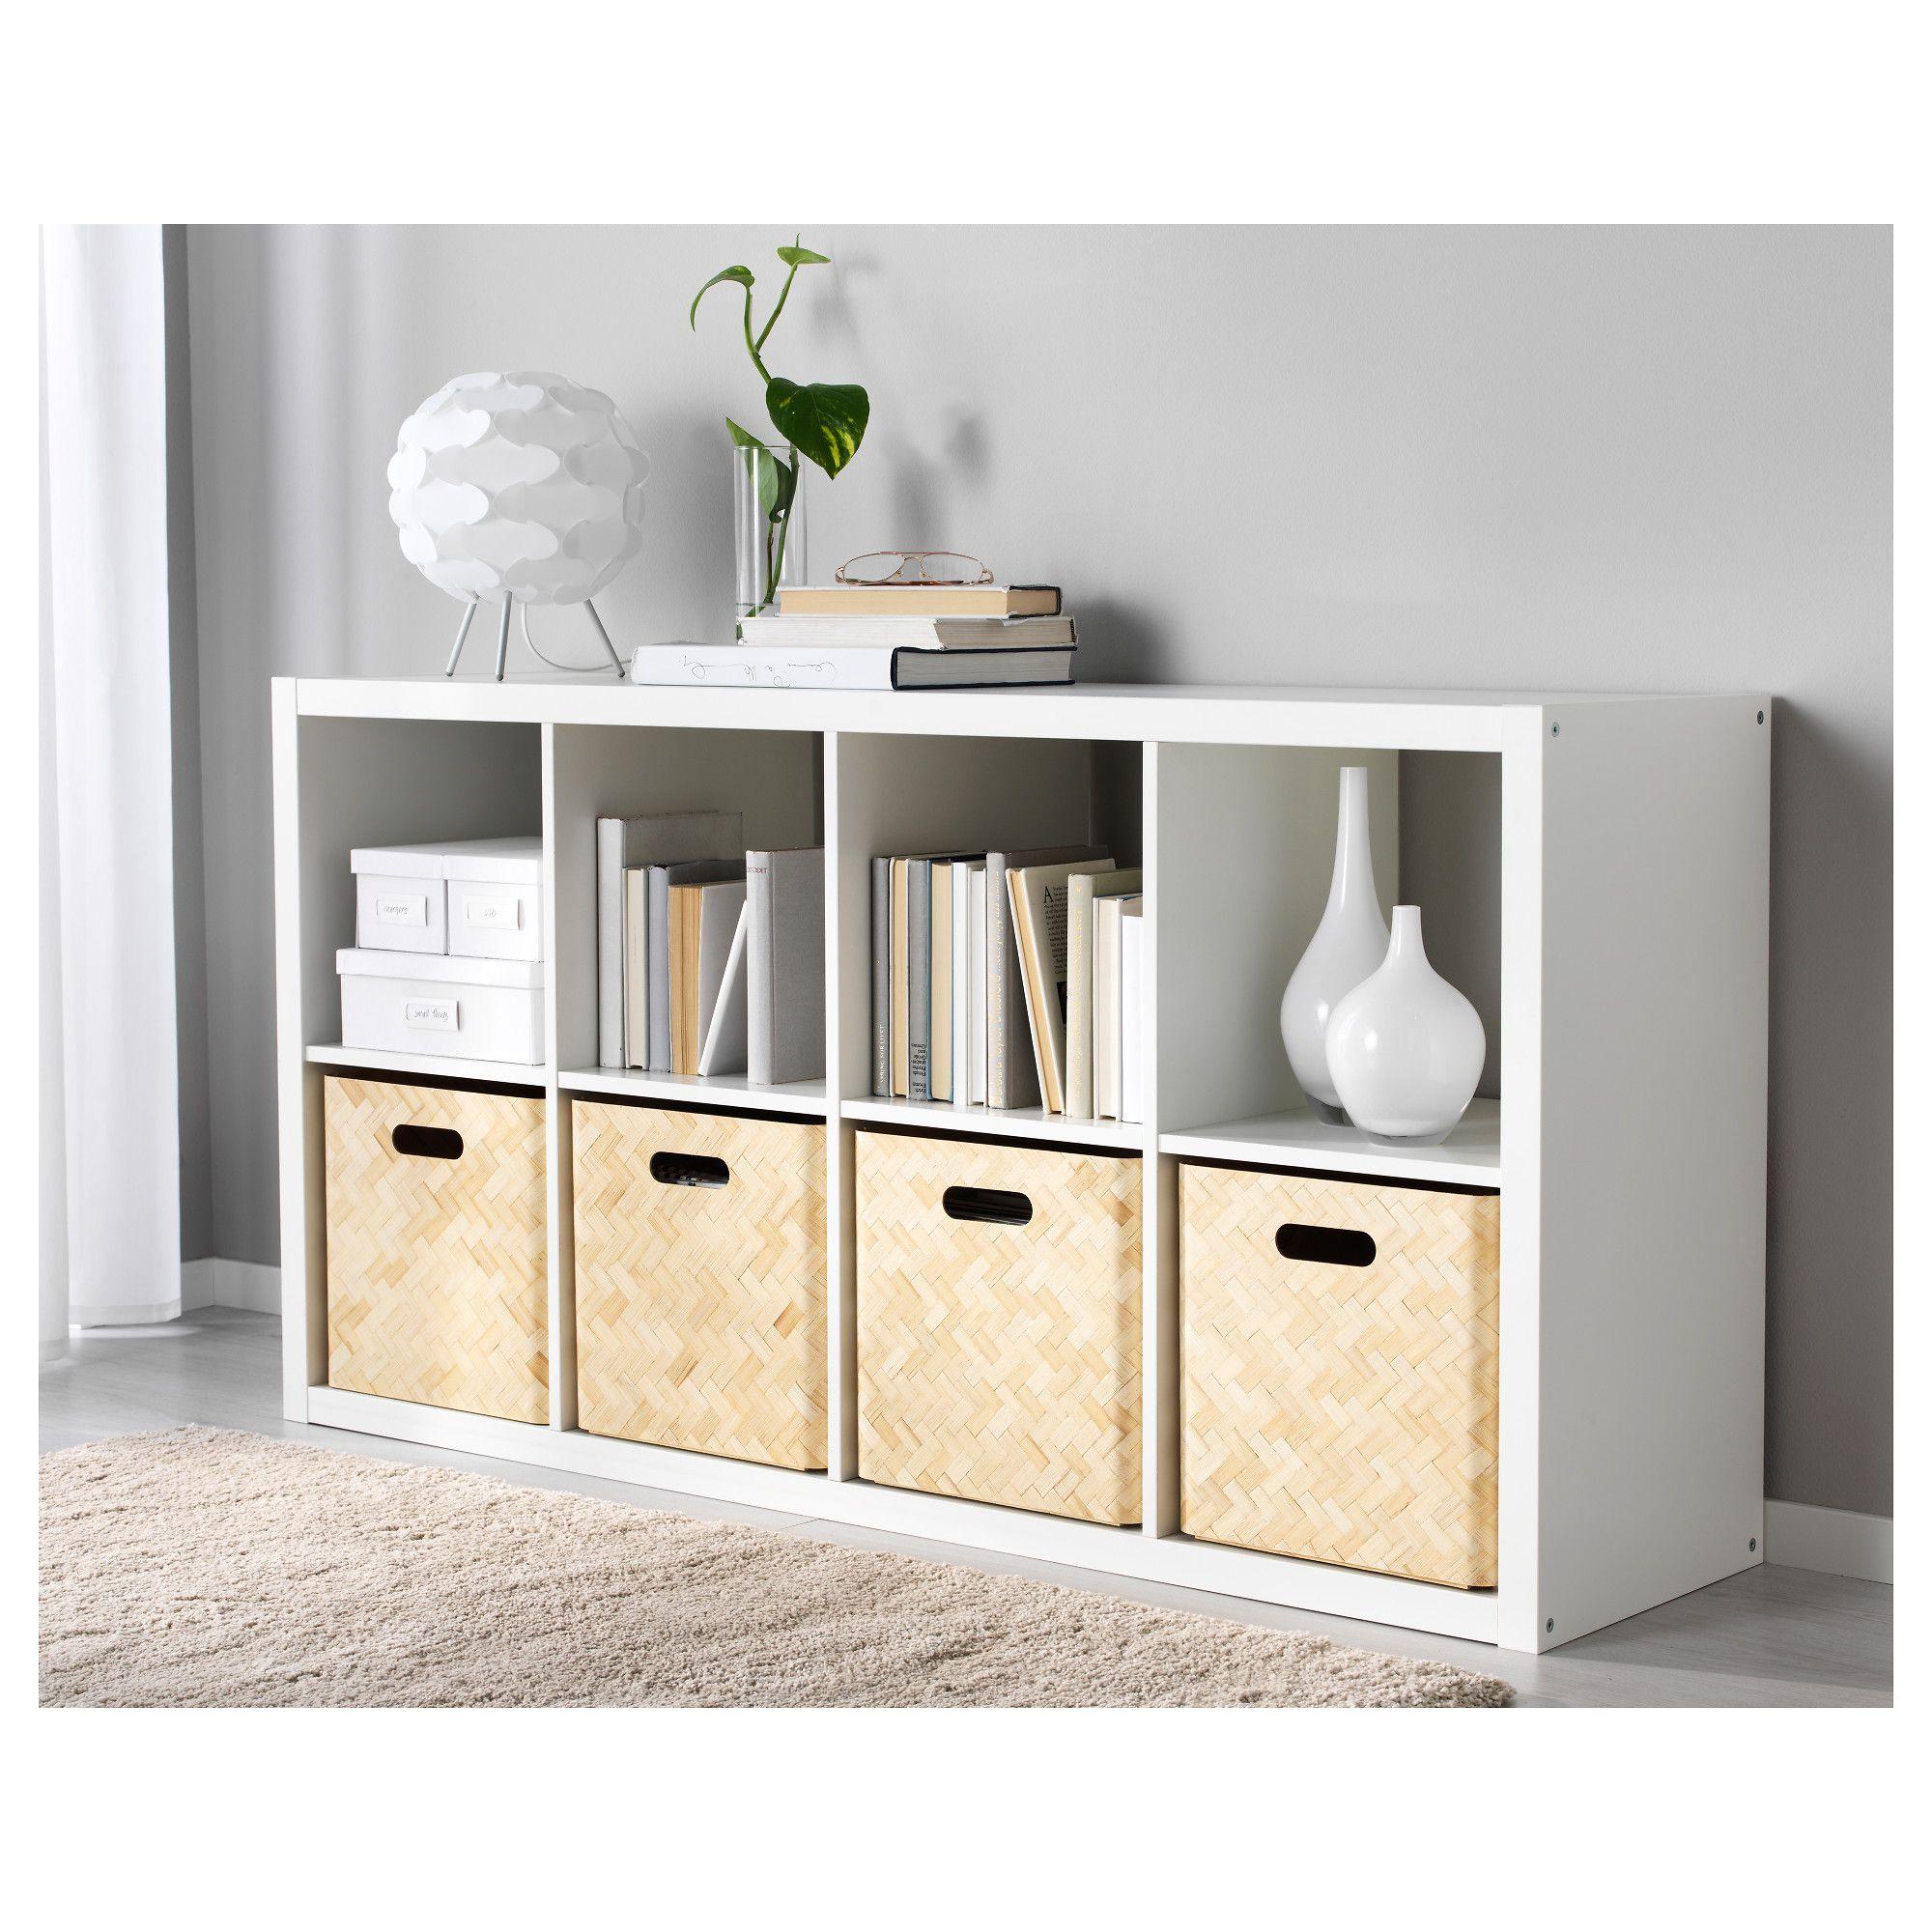 Furniture and Home Furnishings Ikea shelving unit, Ikea